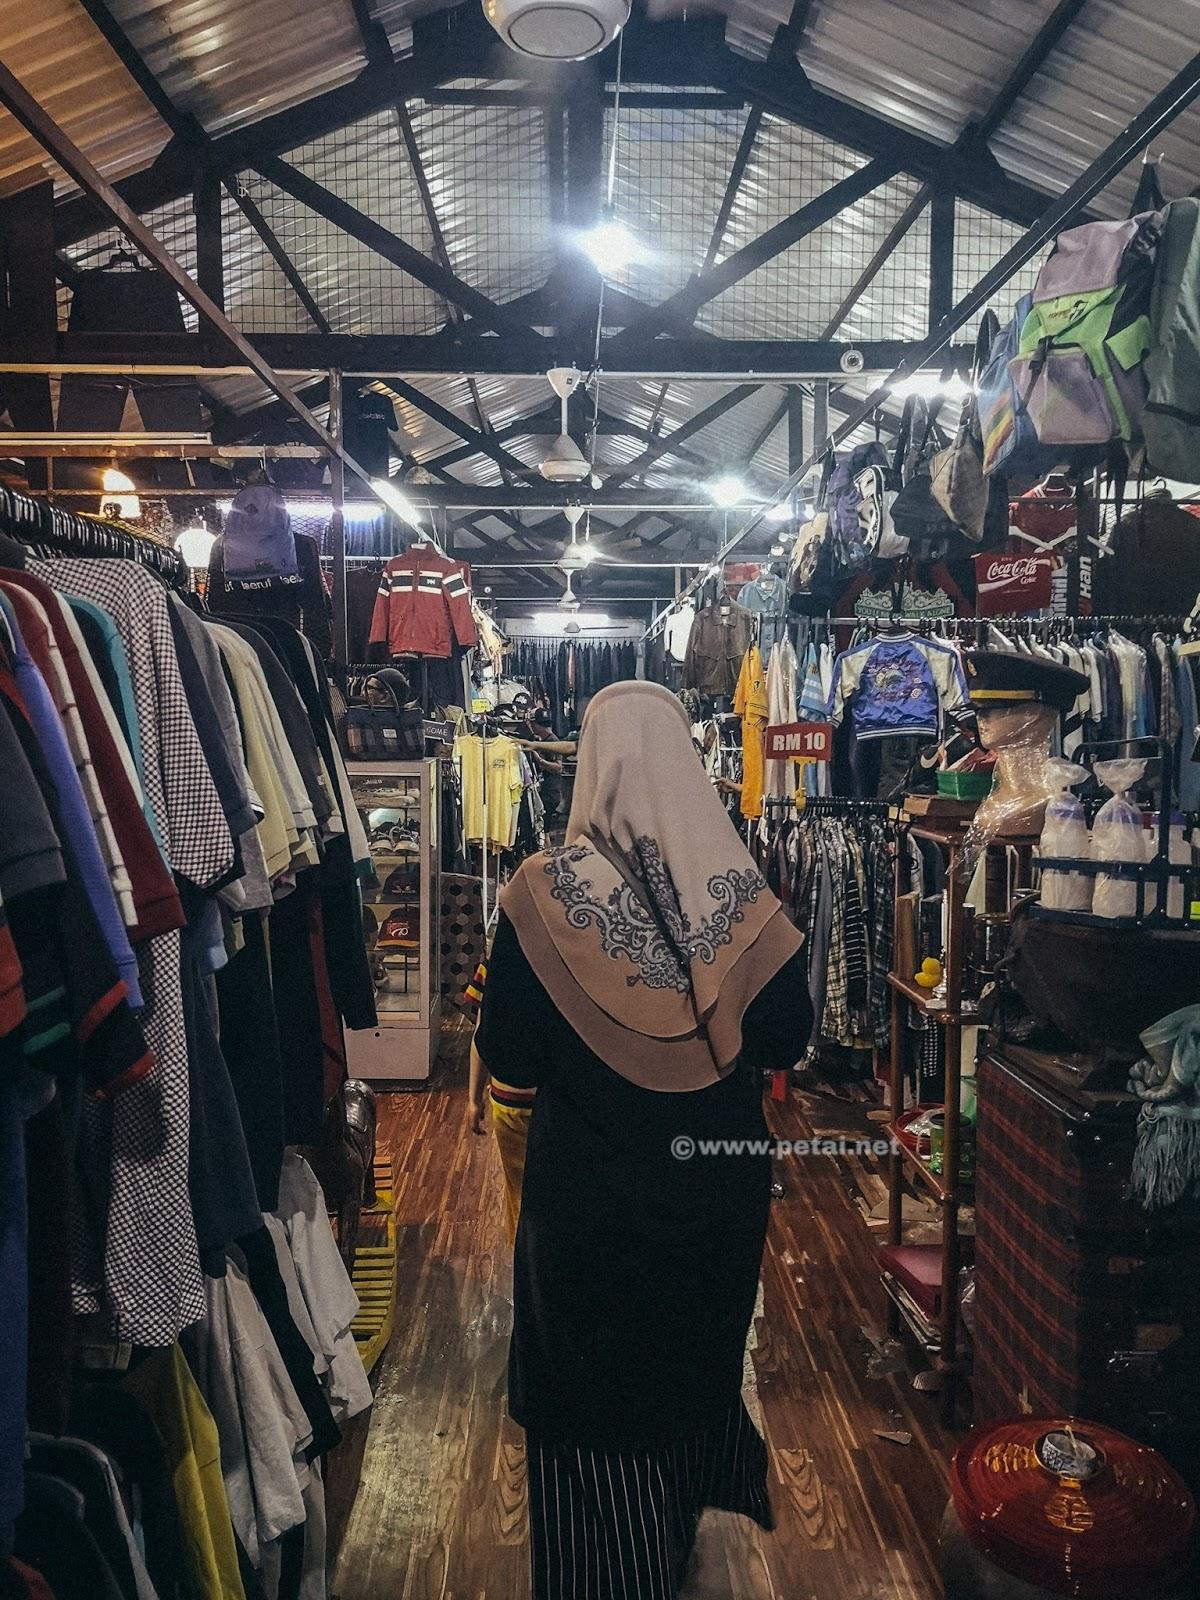 Kantin @ Setor Gombak - dalam kedai